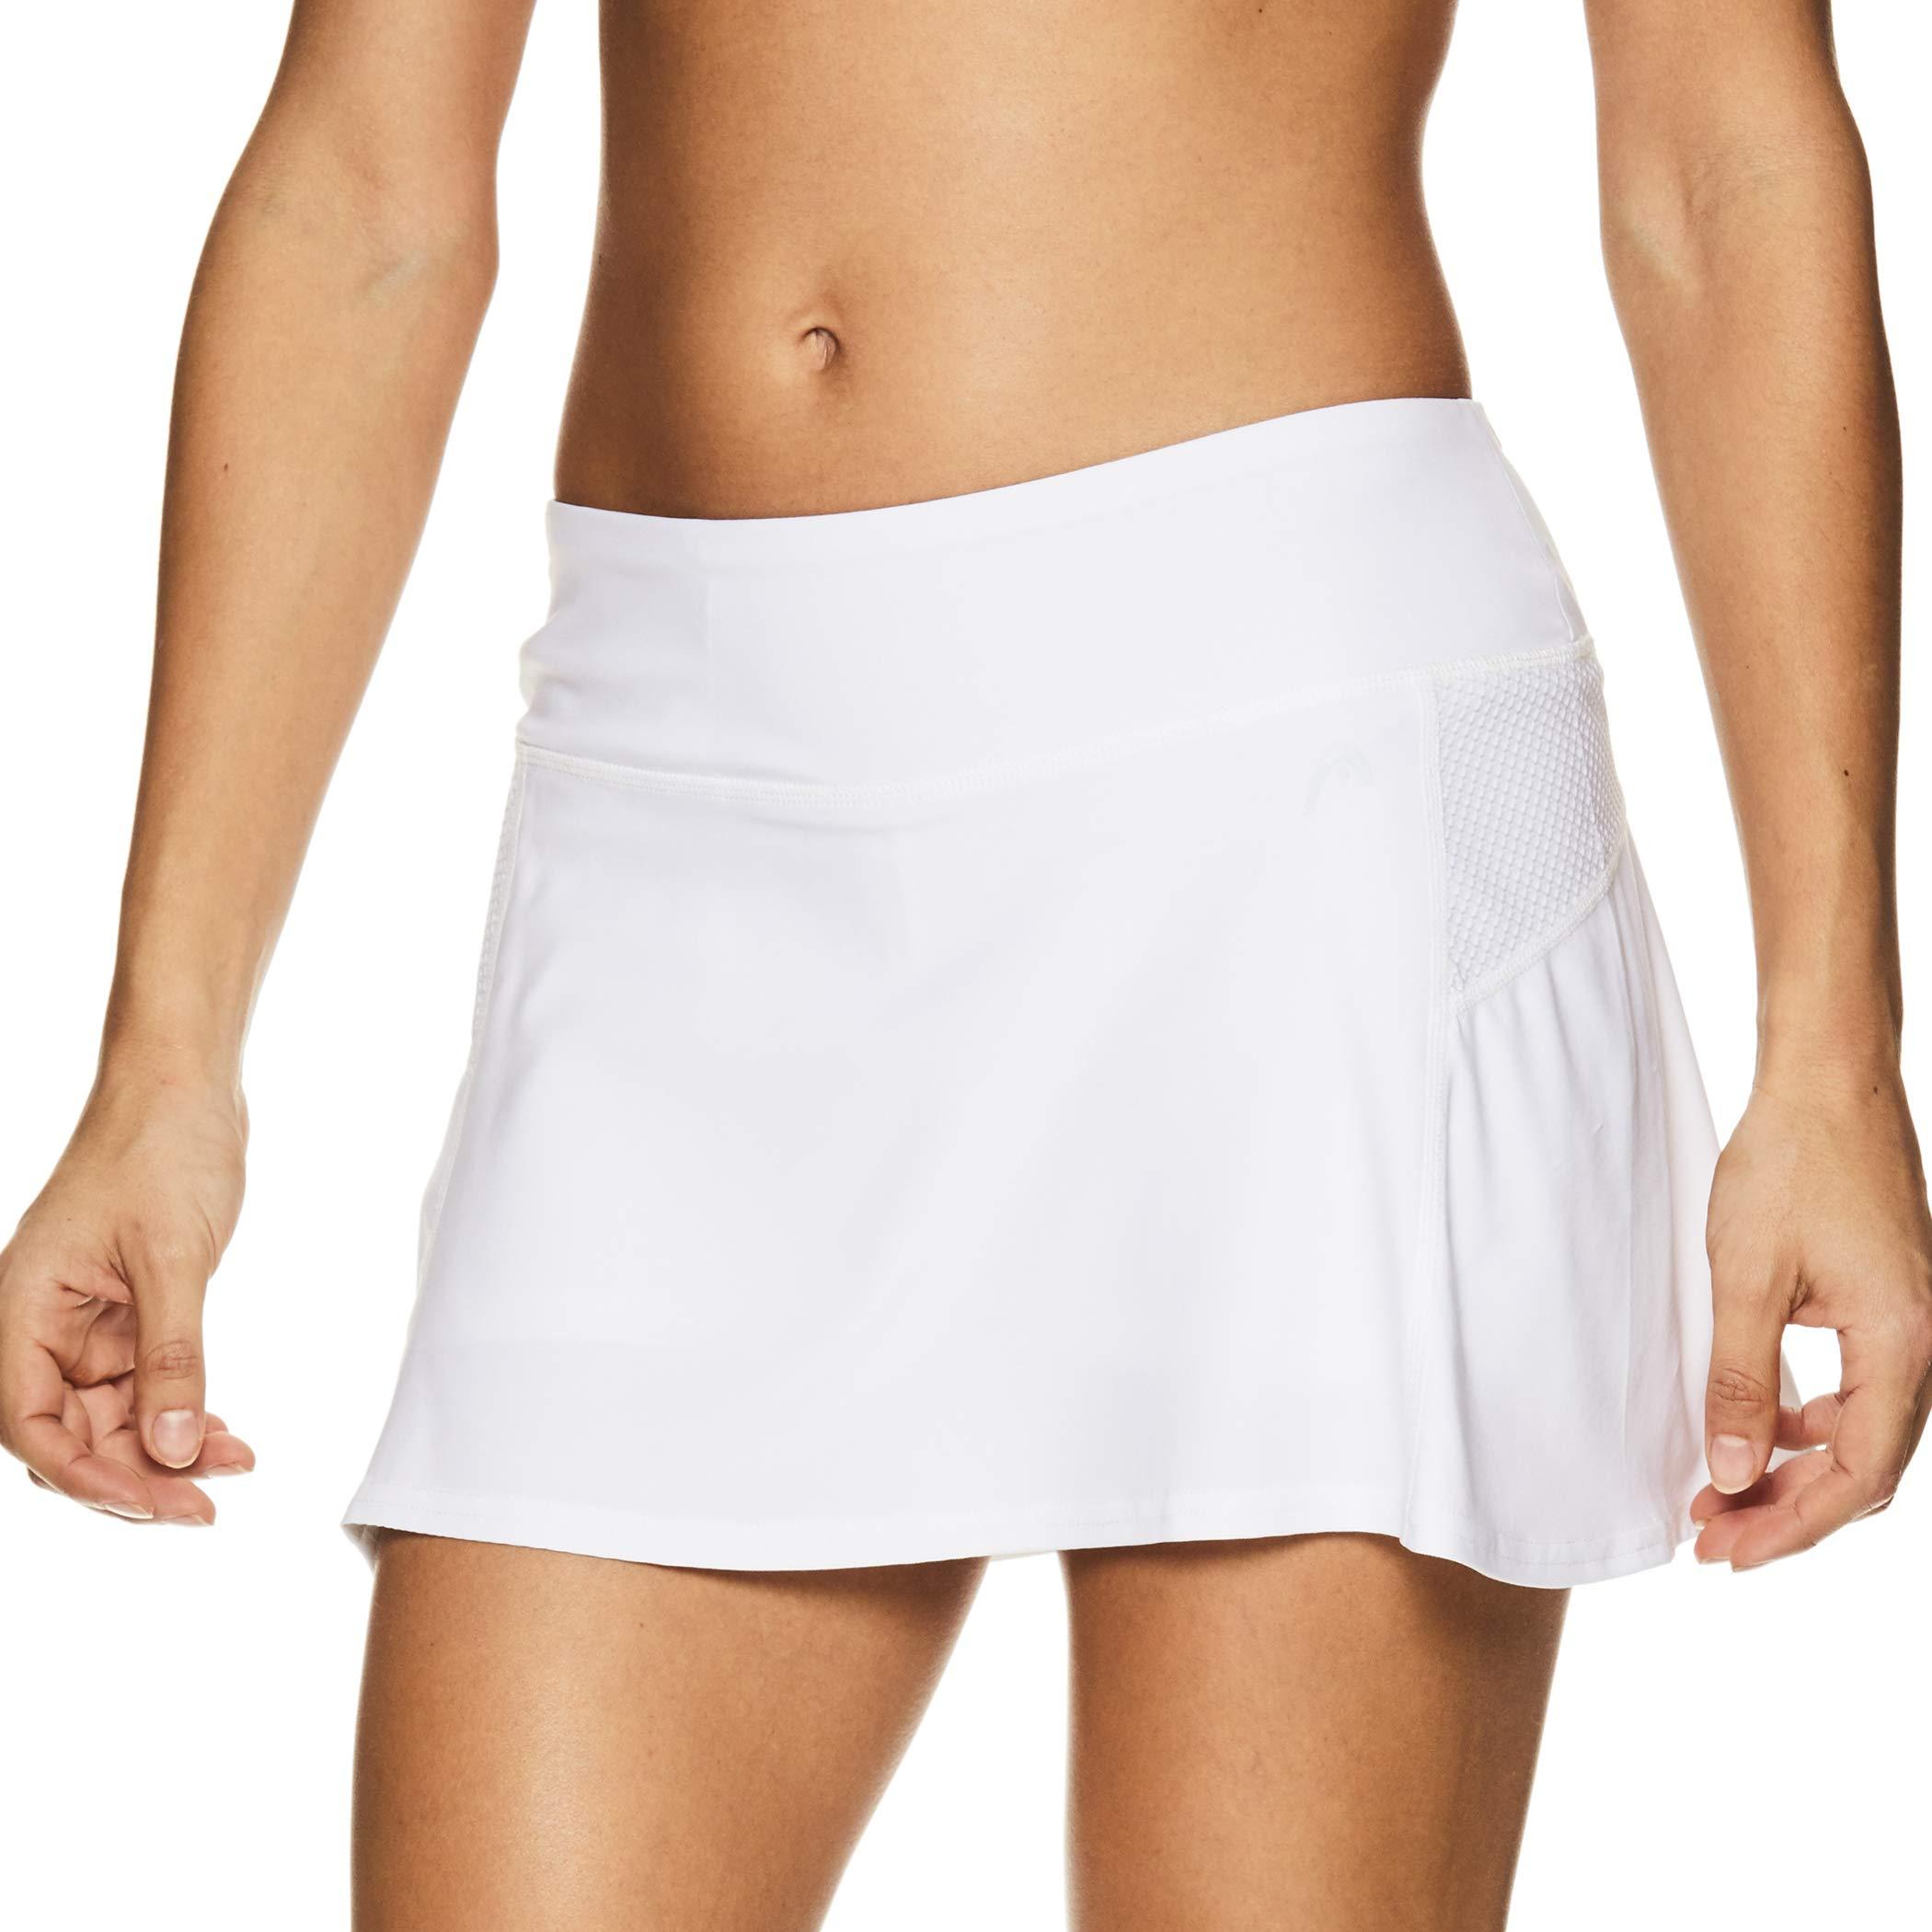 HEAD Women's Athletic Tennis Skort - Performance Training & Running Skirt - Fresh Mesh Stark White, X-Small